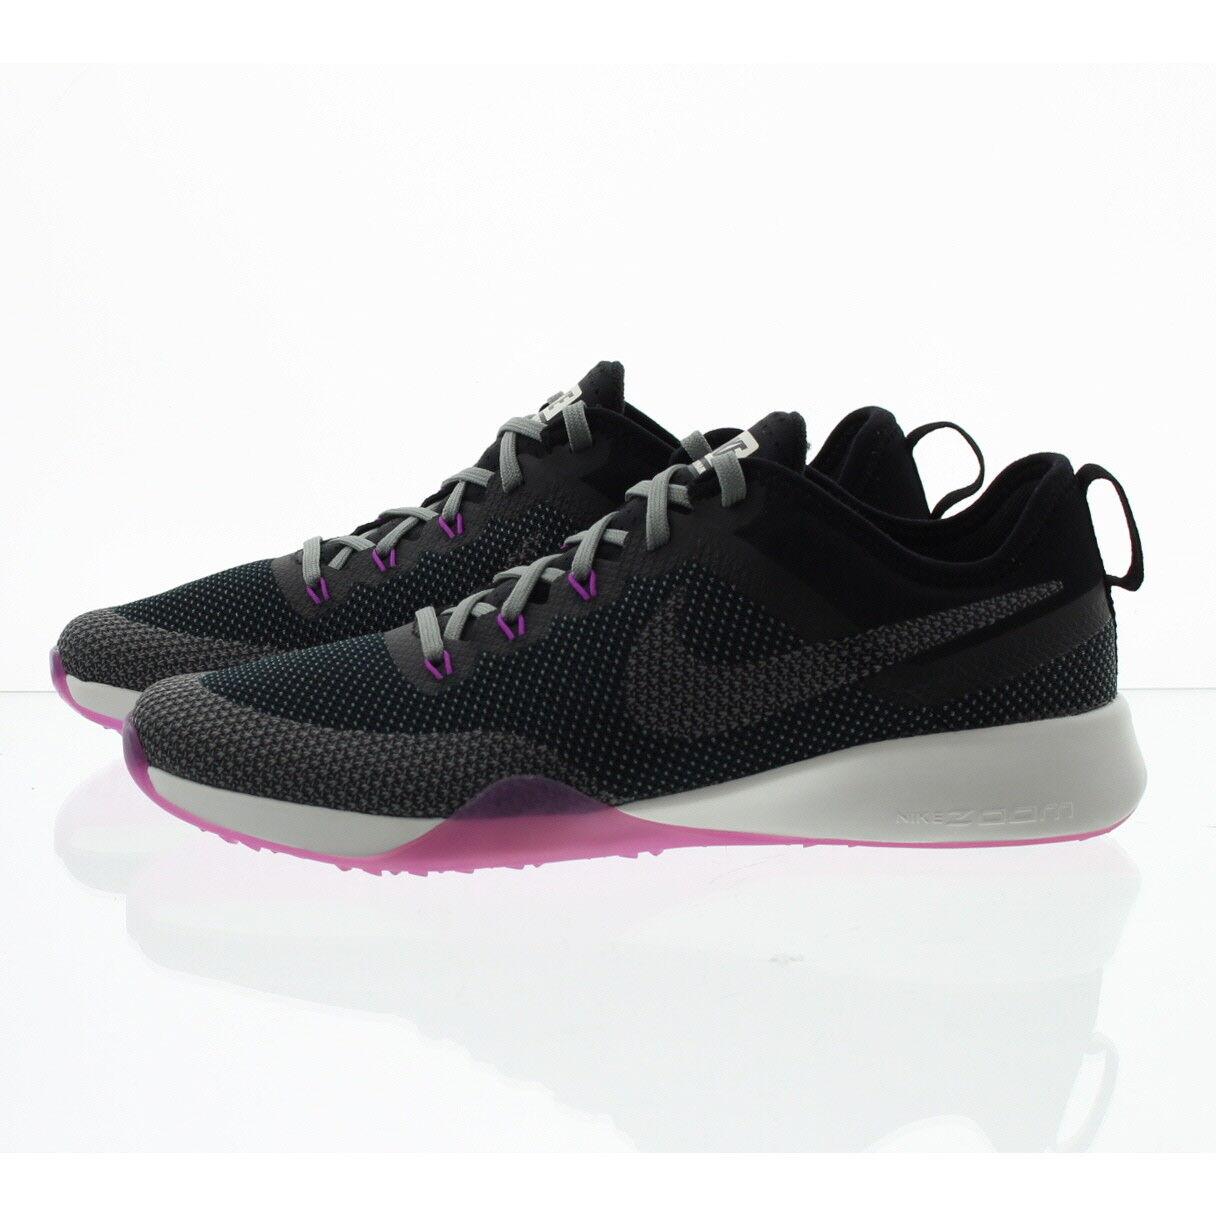 Nike 849803 Mens Air Zoom Dynamic Mesh Training Training Training Running Low Top shoes Sneakers 952e94